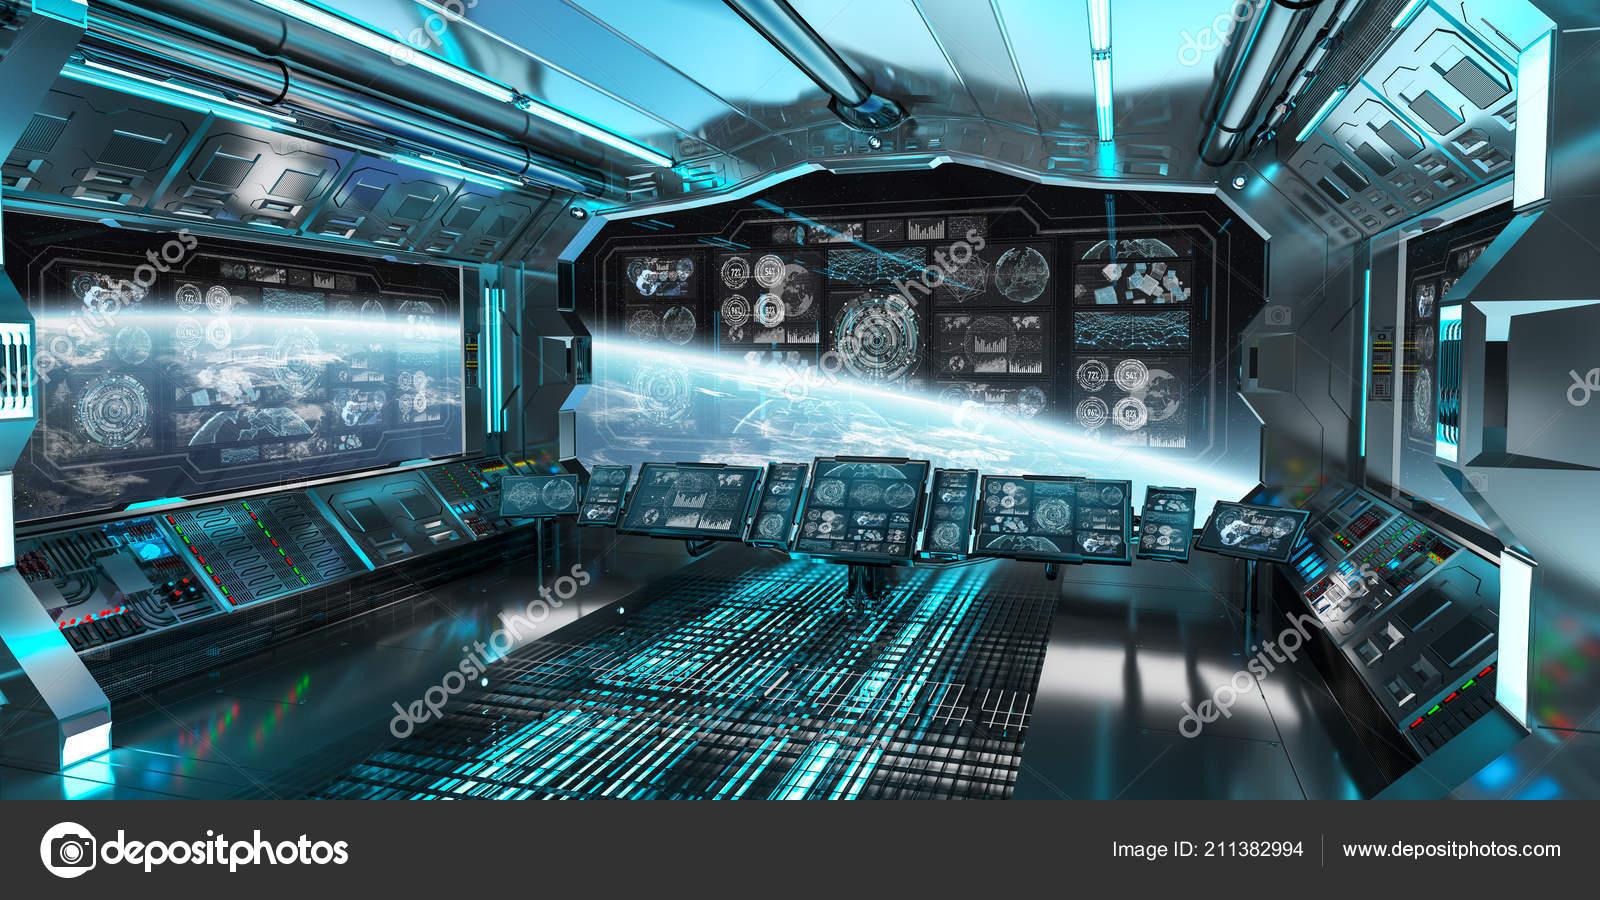 Blue Spaceship Interior Space Control Panel Screens